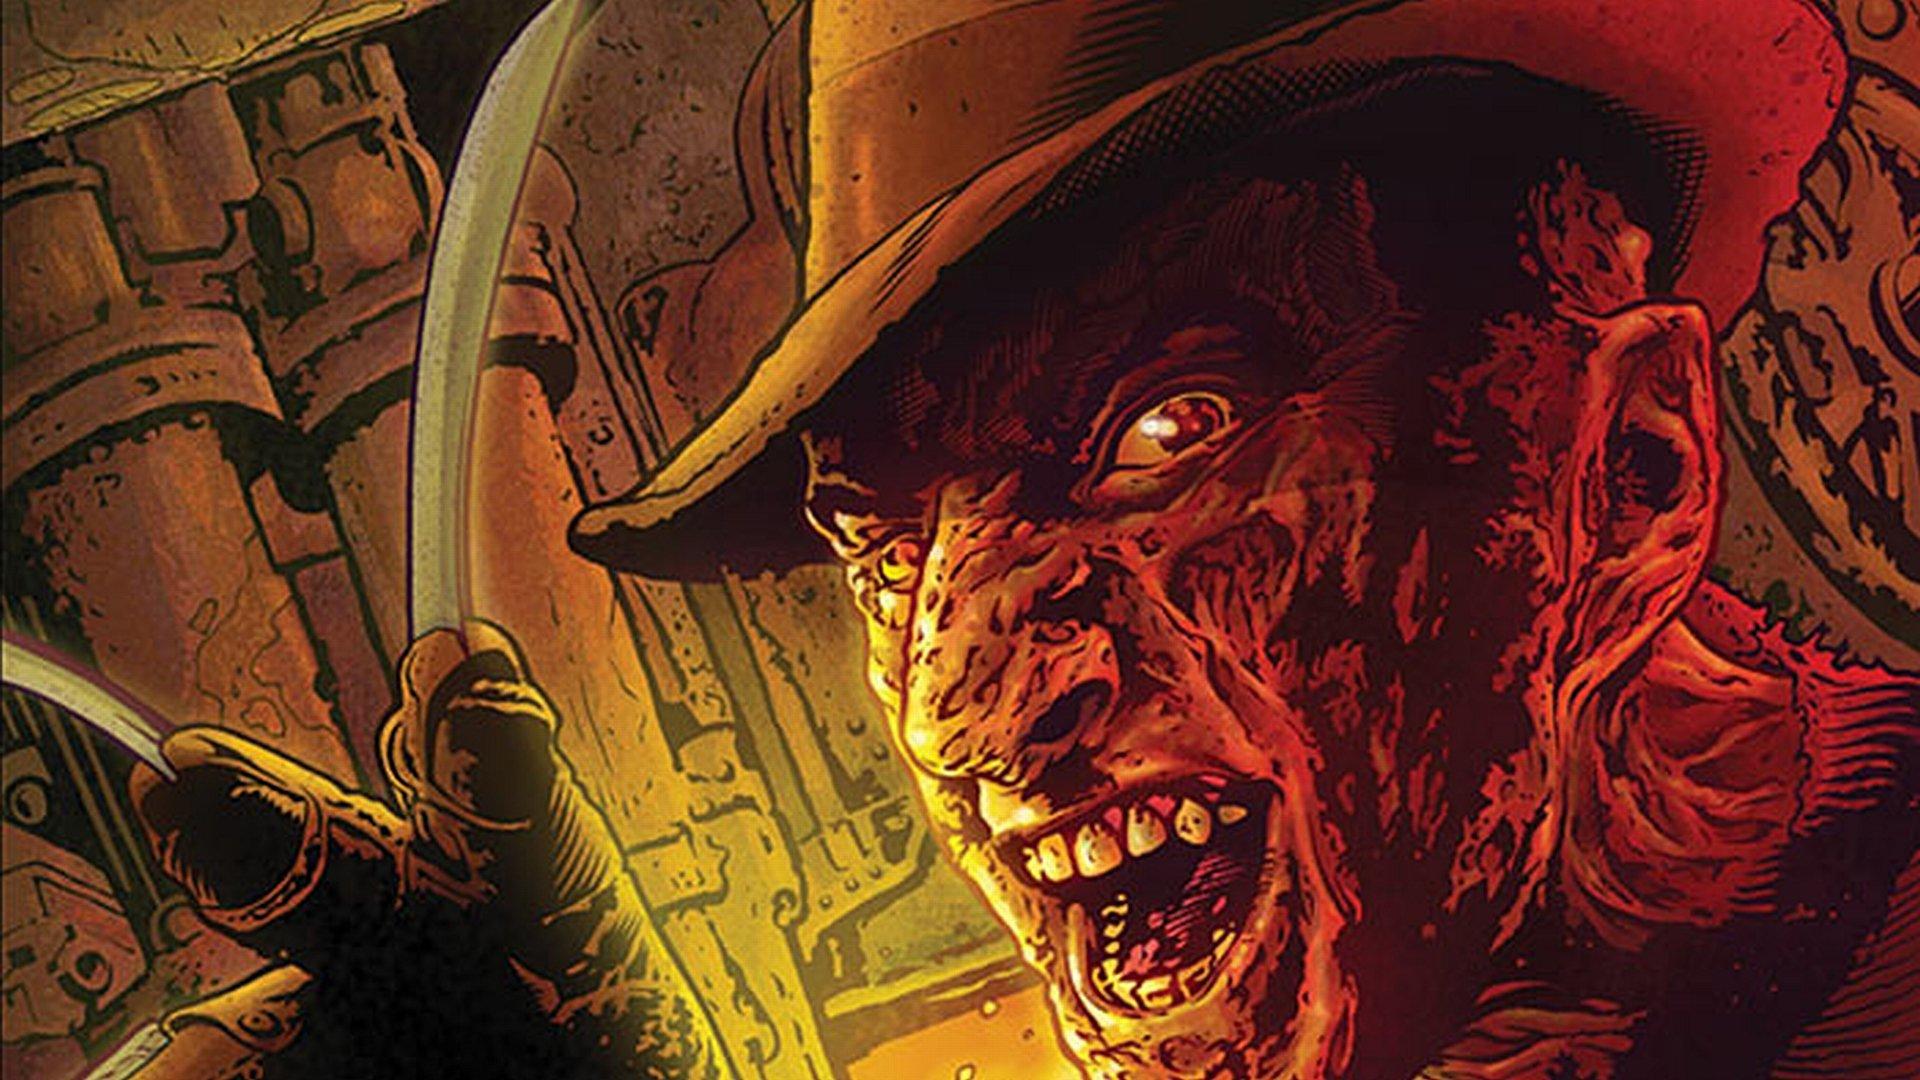 A Nightmare On Elm Street Wallpapers 1920x1080 Full Hd 1080p